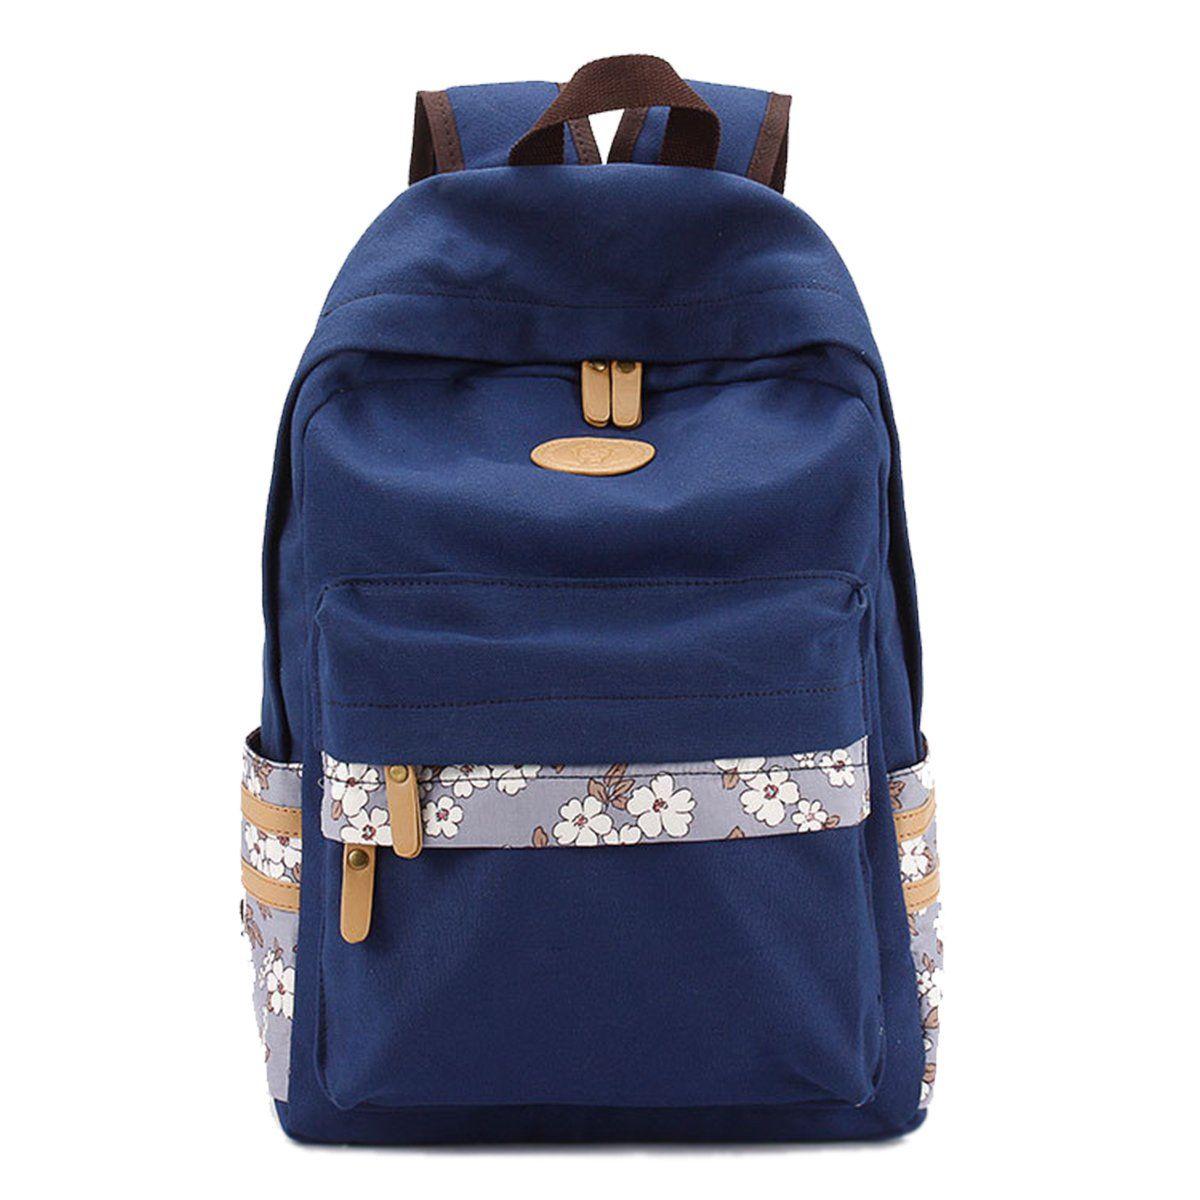 9f5f2fb522 VentoMarea Lightweight Canvas Backpacks for Teen Girls School Bag Casual  Travel Daypacks